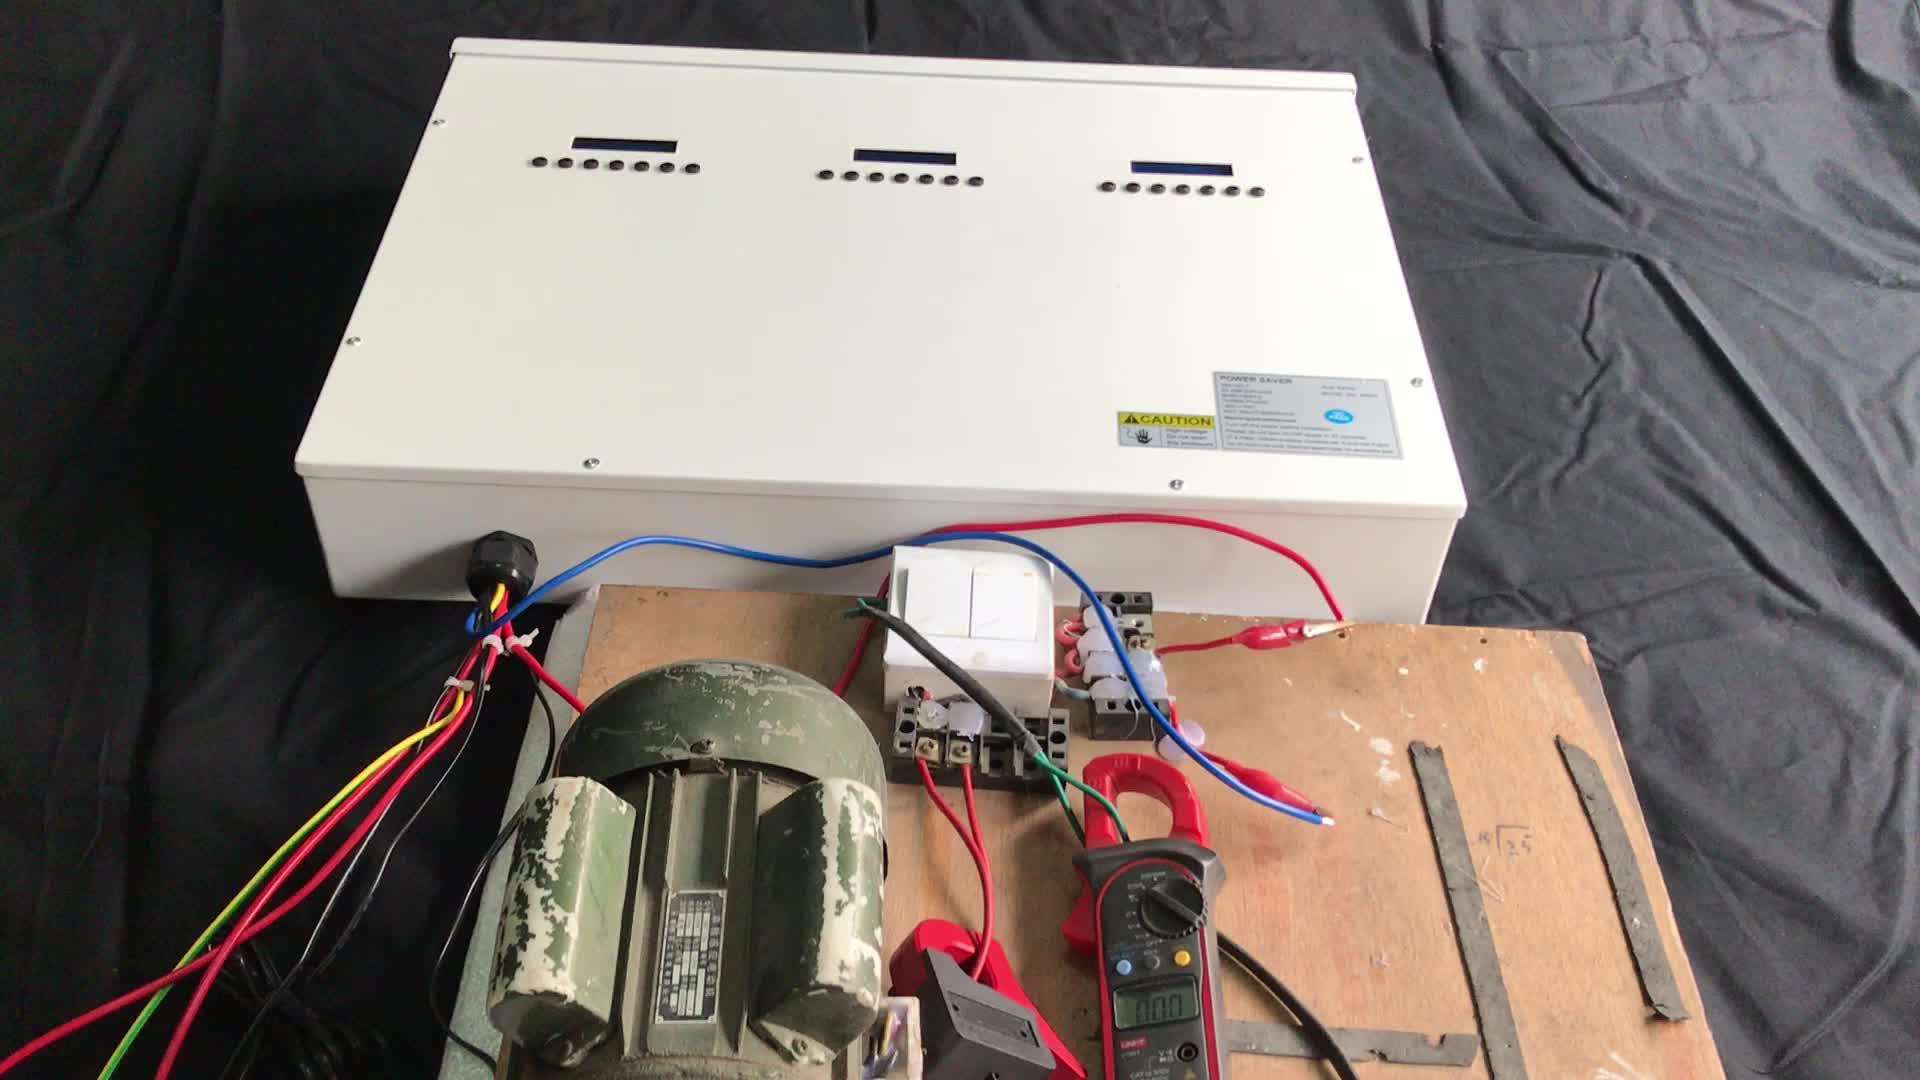 Intelligent Electricity-saving box /power saver/energy saving unit for Industry use